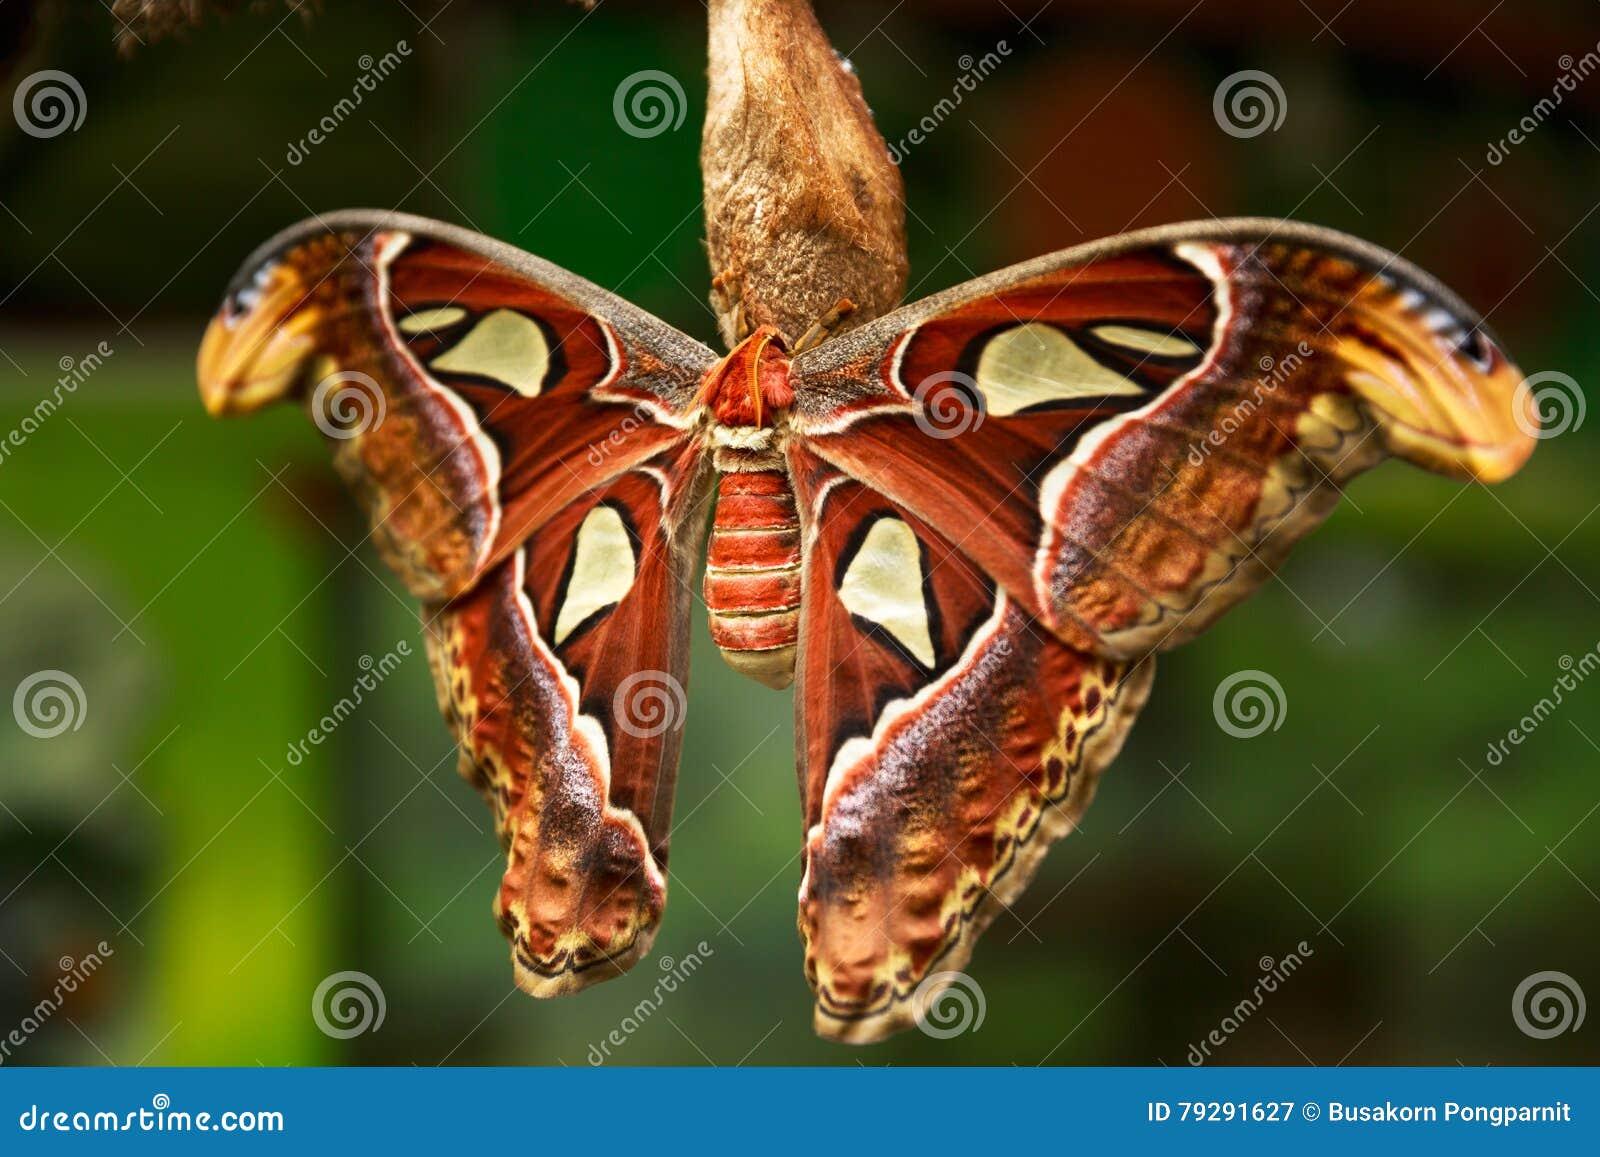 The Atlas moth Attacus atlas, Beautiful big butterfly